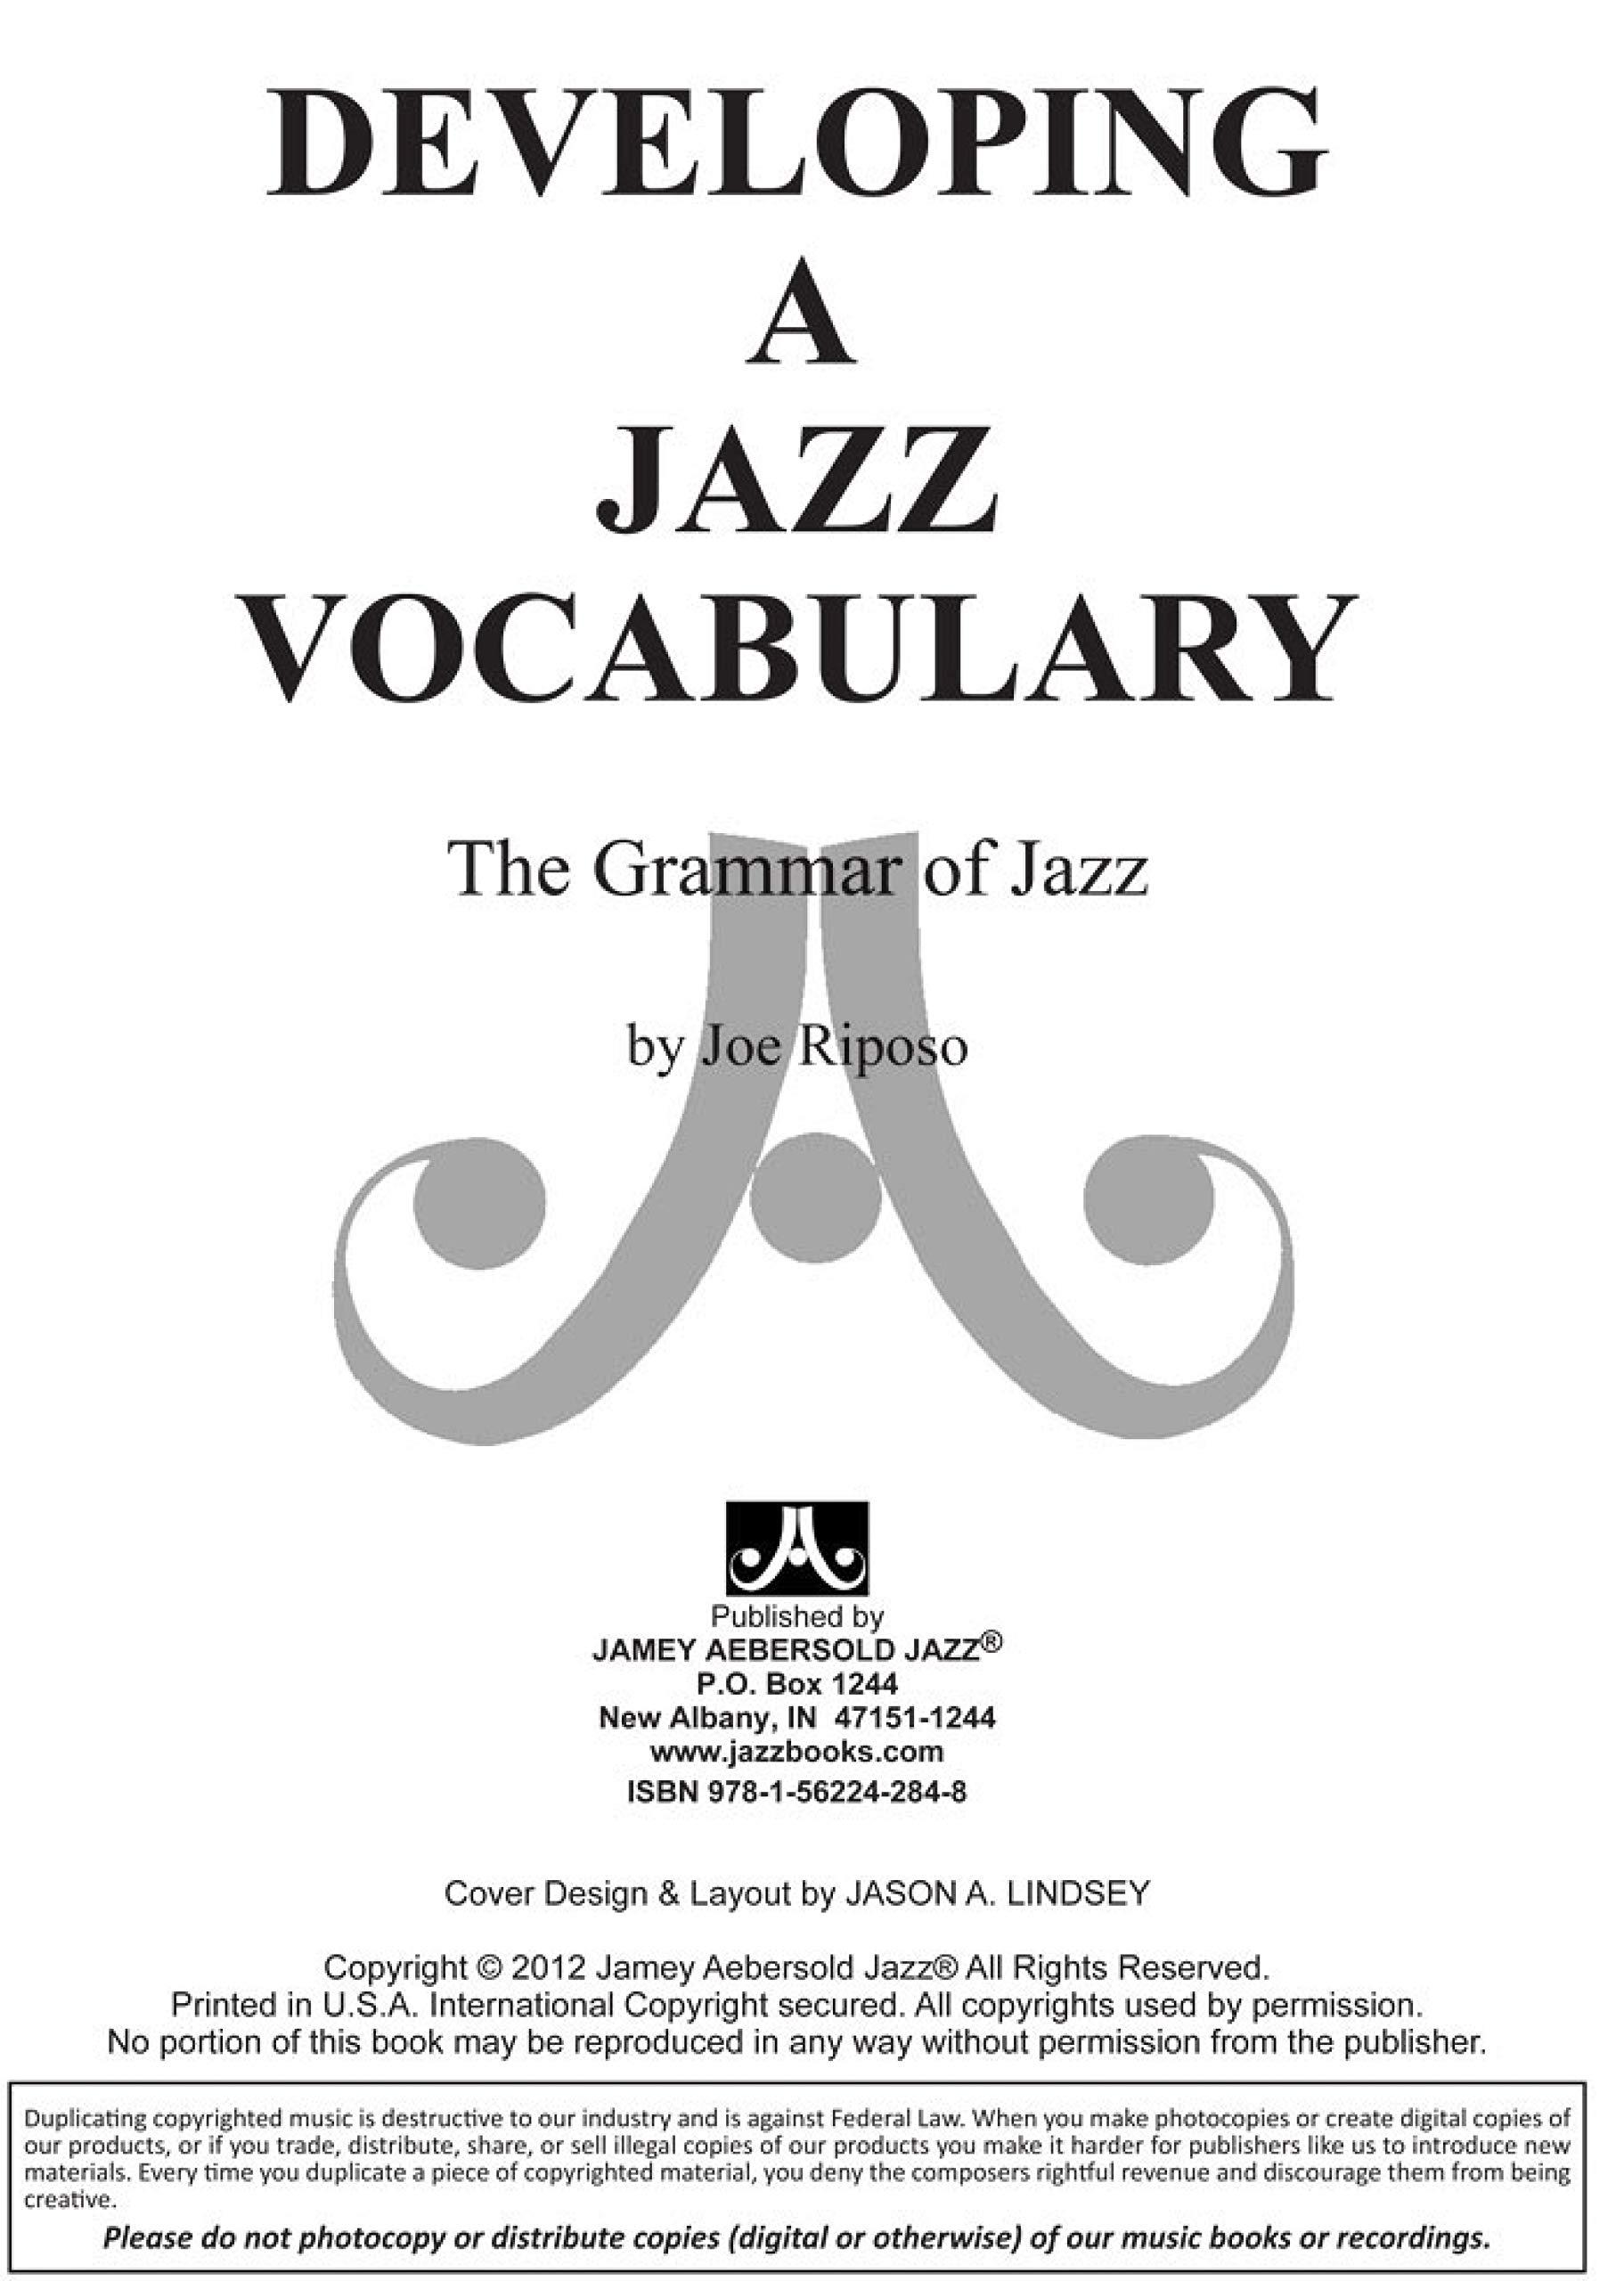 Developing a Jazz Vocabulary